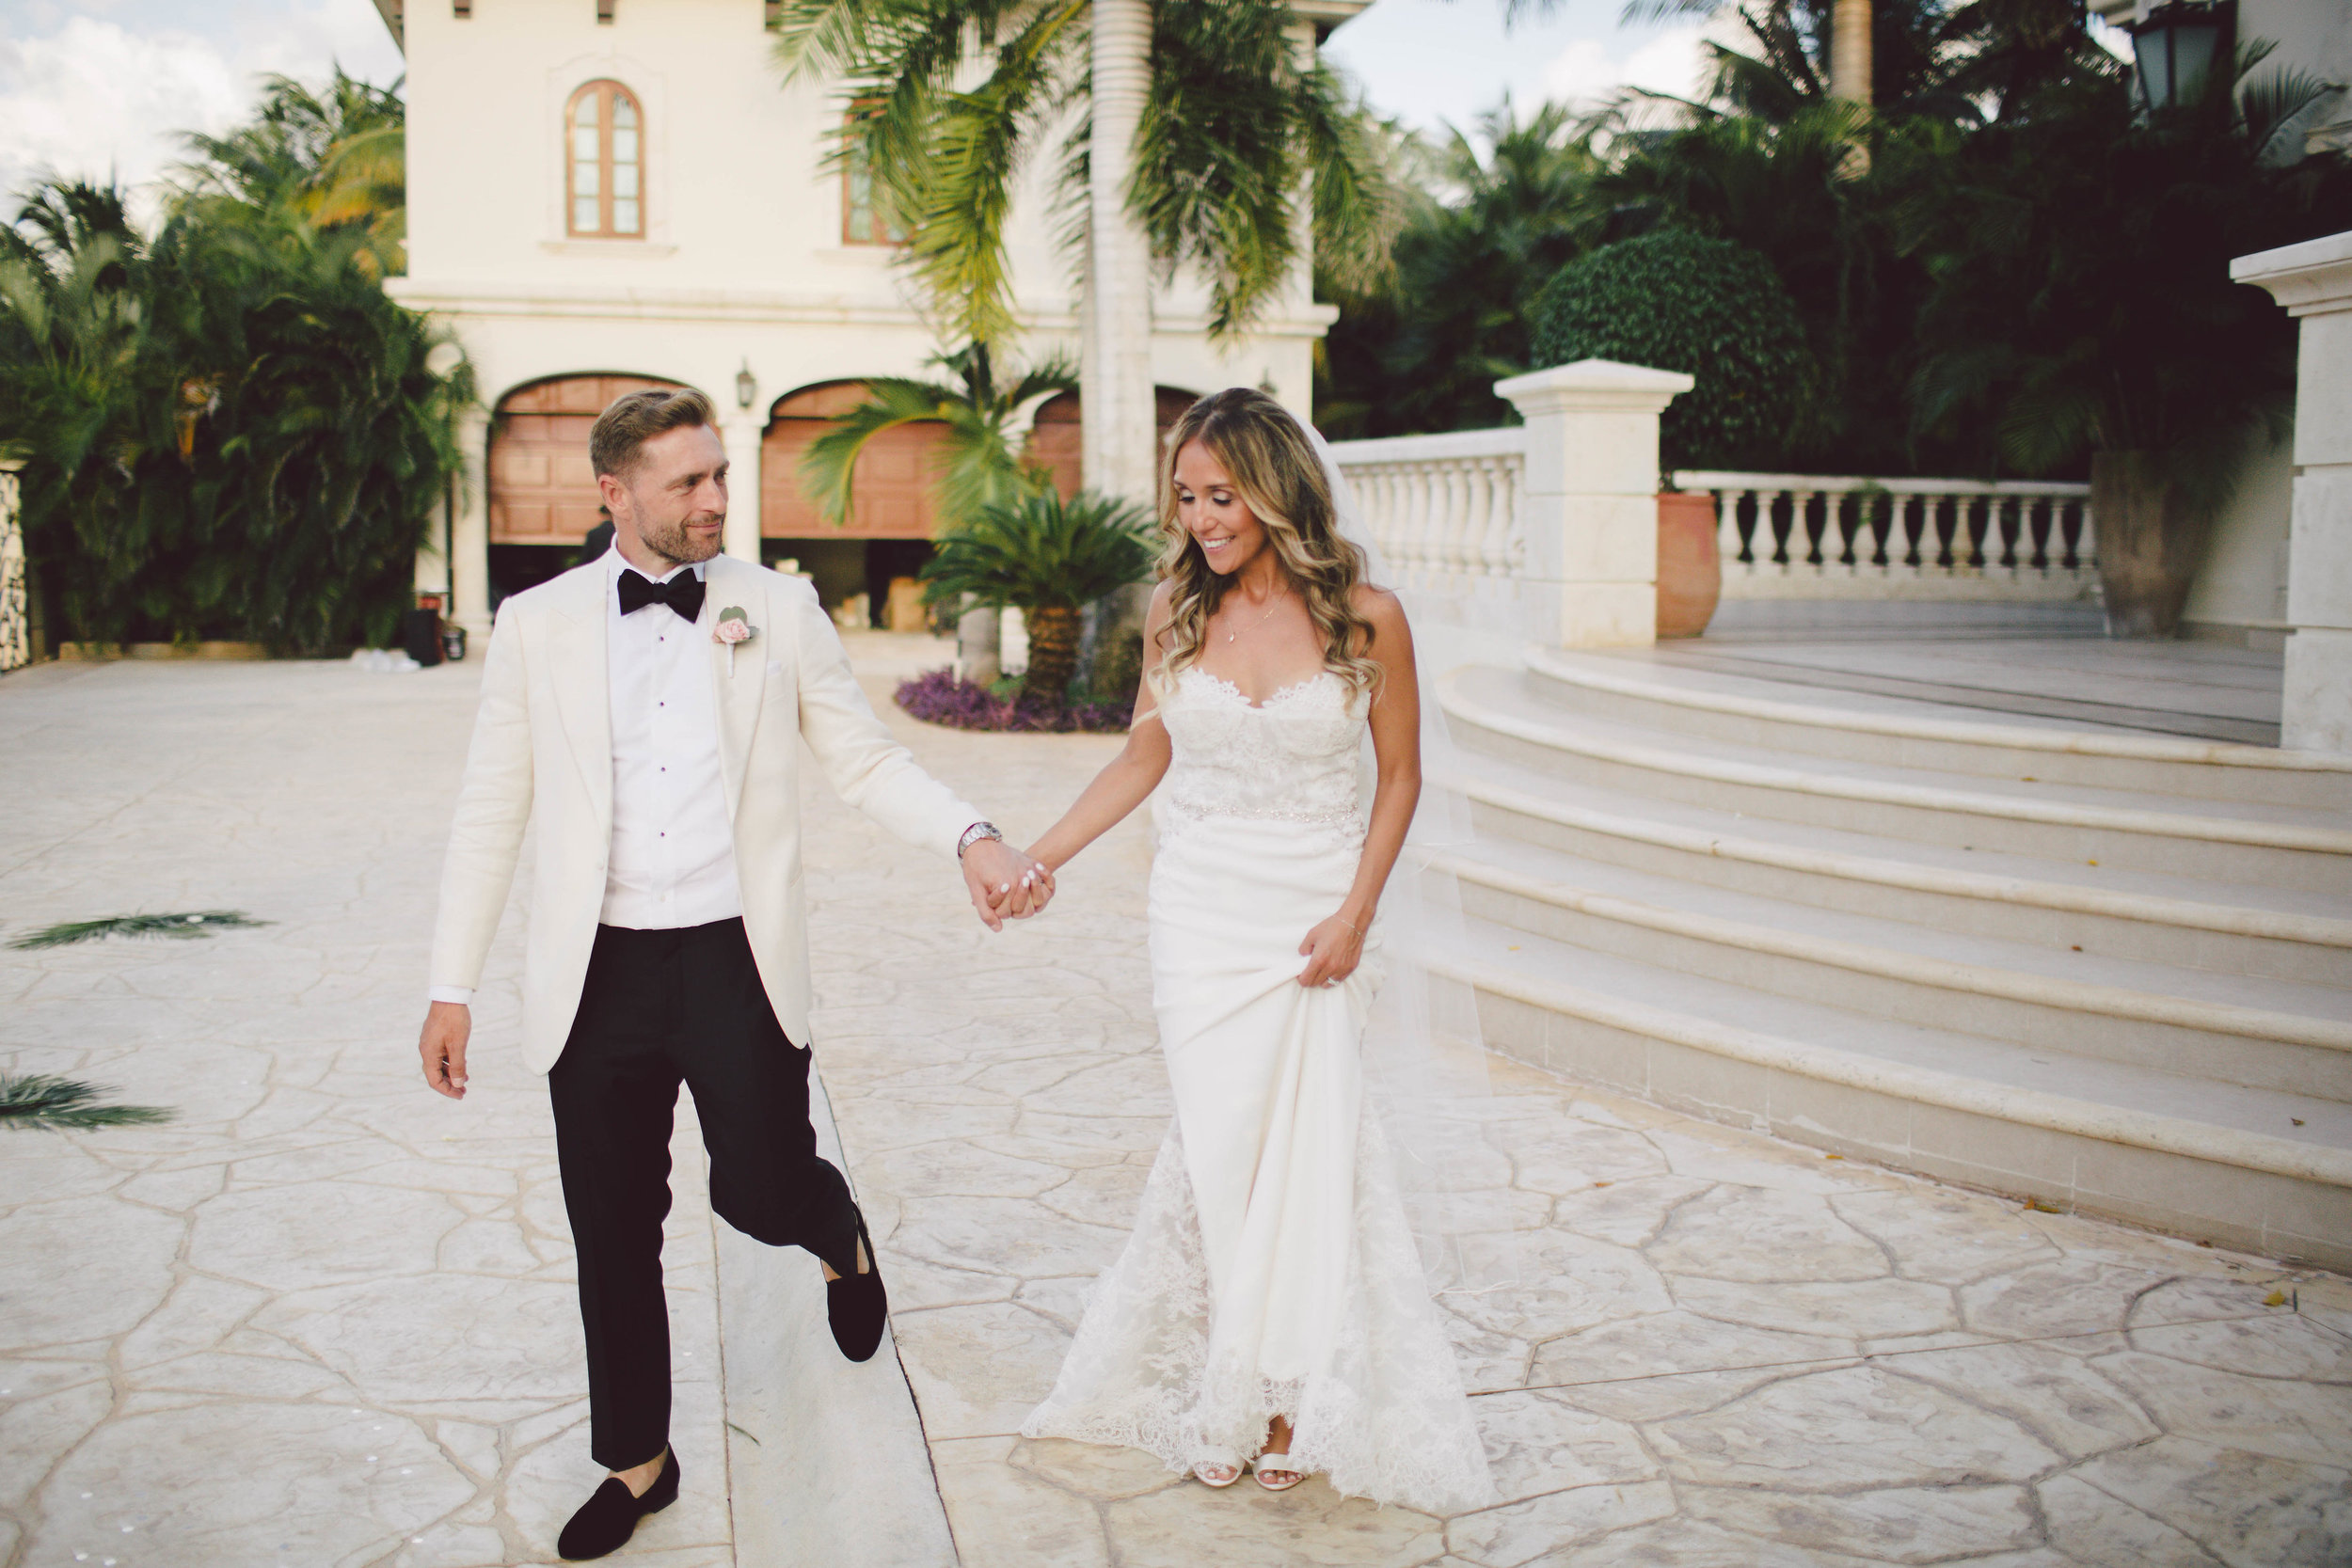 mexico_wedding_cancun_villa_la_joya_evangeline_lane_096.jpg